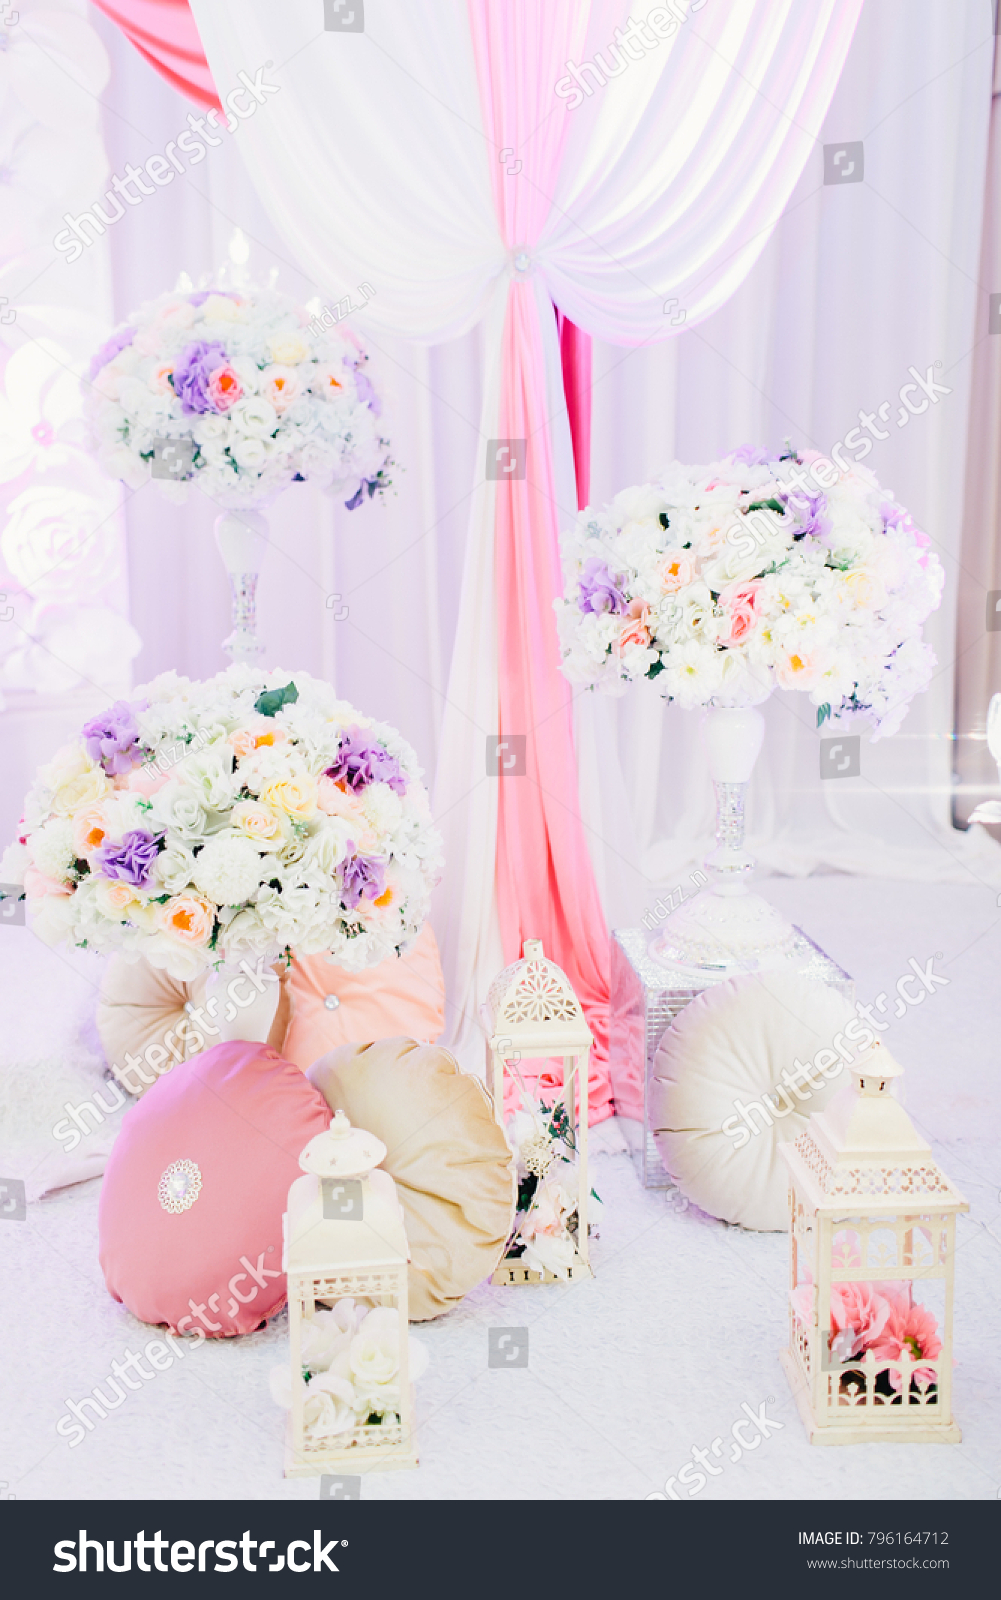 Beautiful artificial flower arrangement for wedding ceremony ez canvas id 796164712 izmirmasajfo